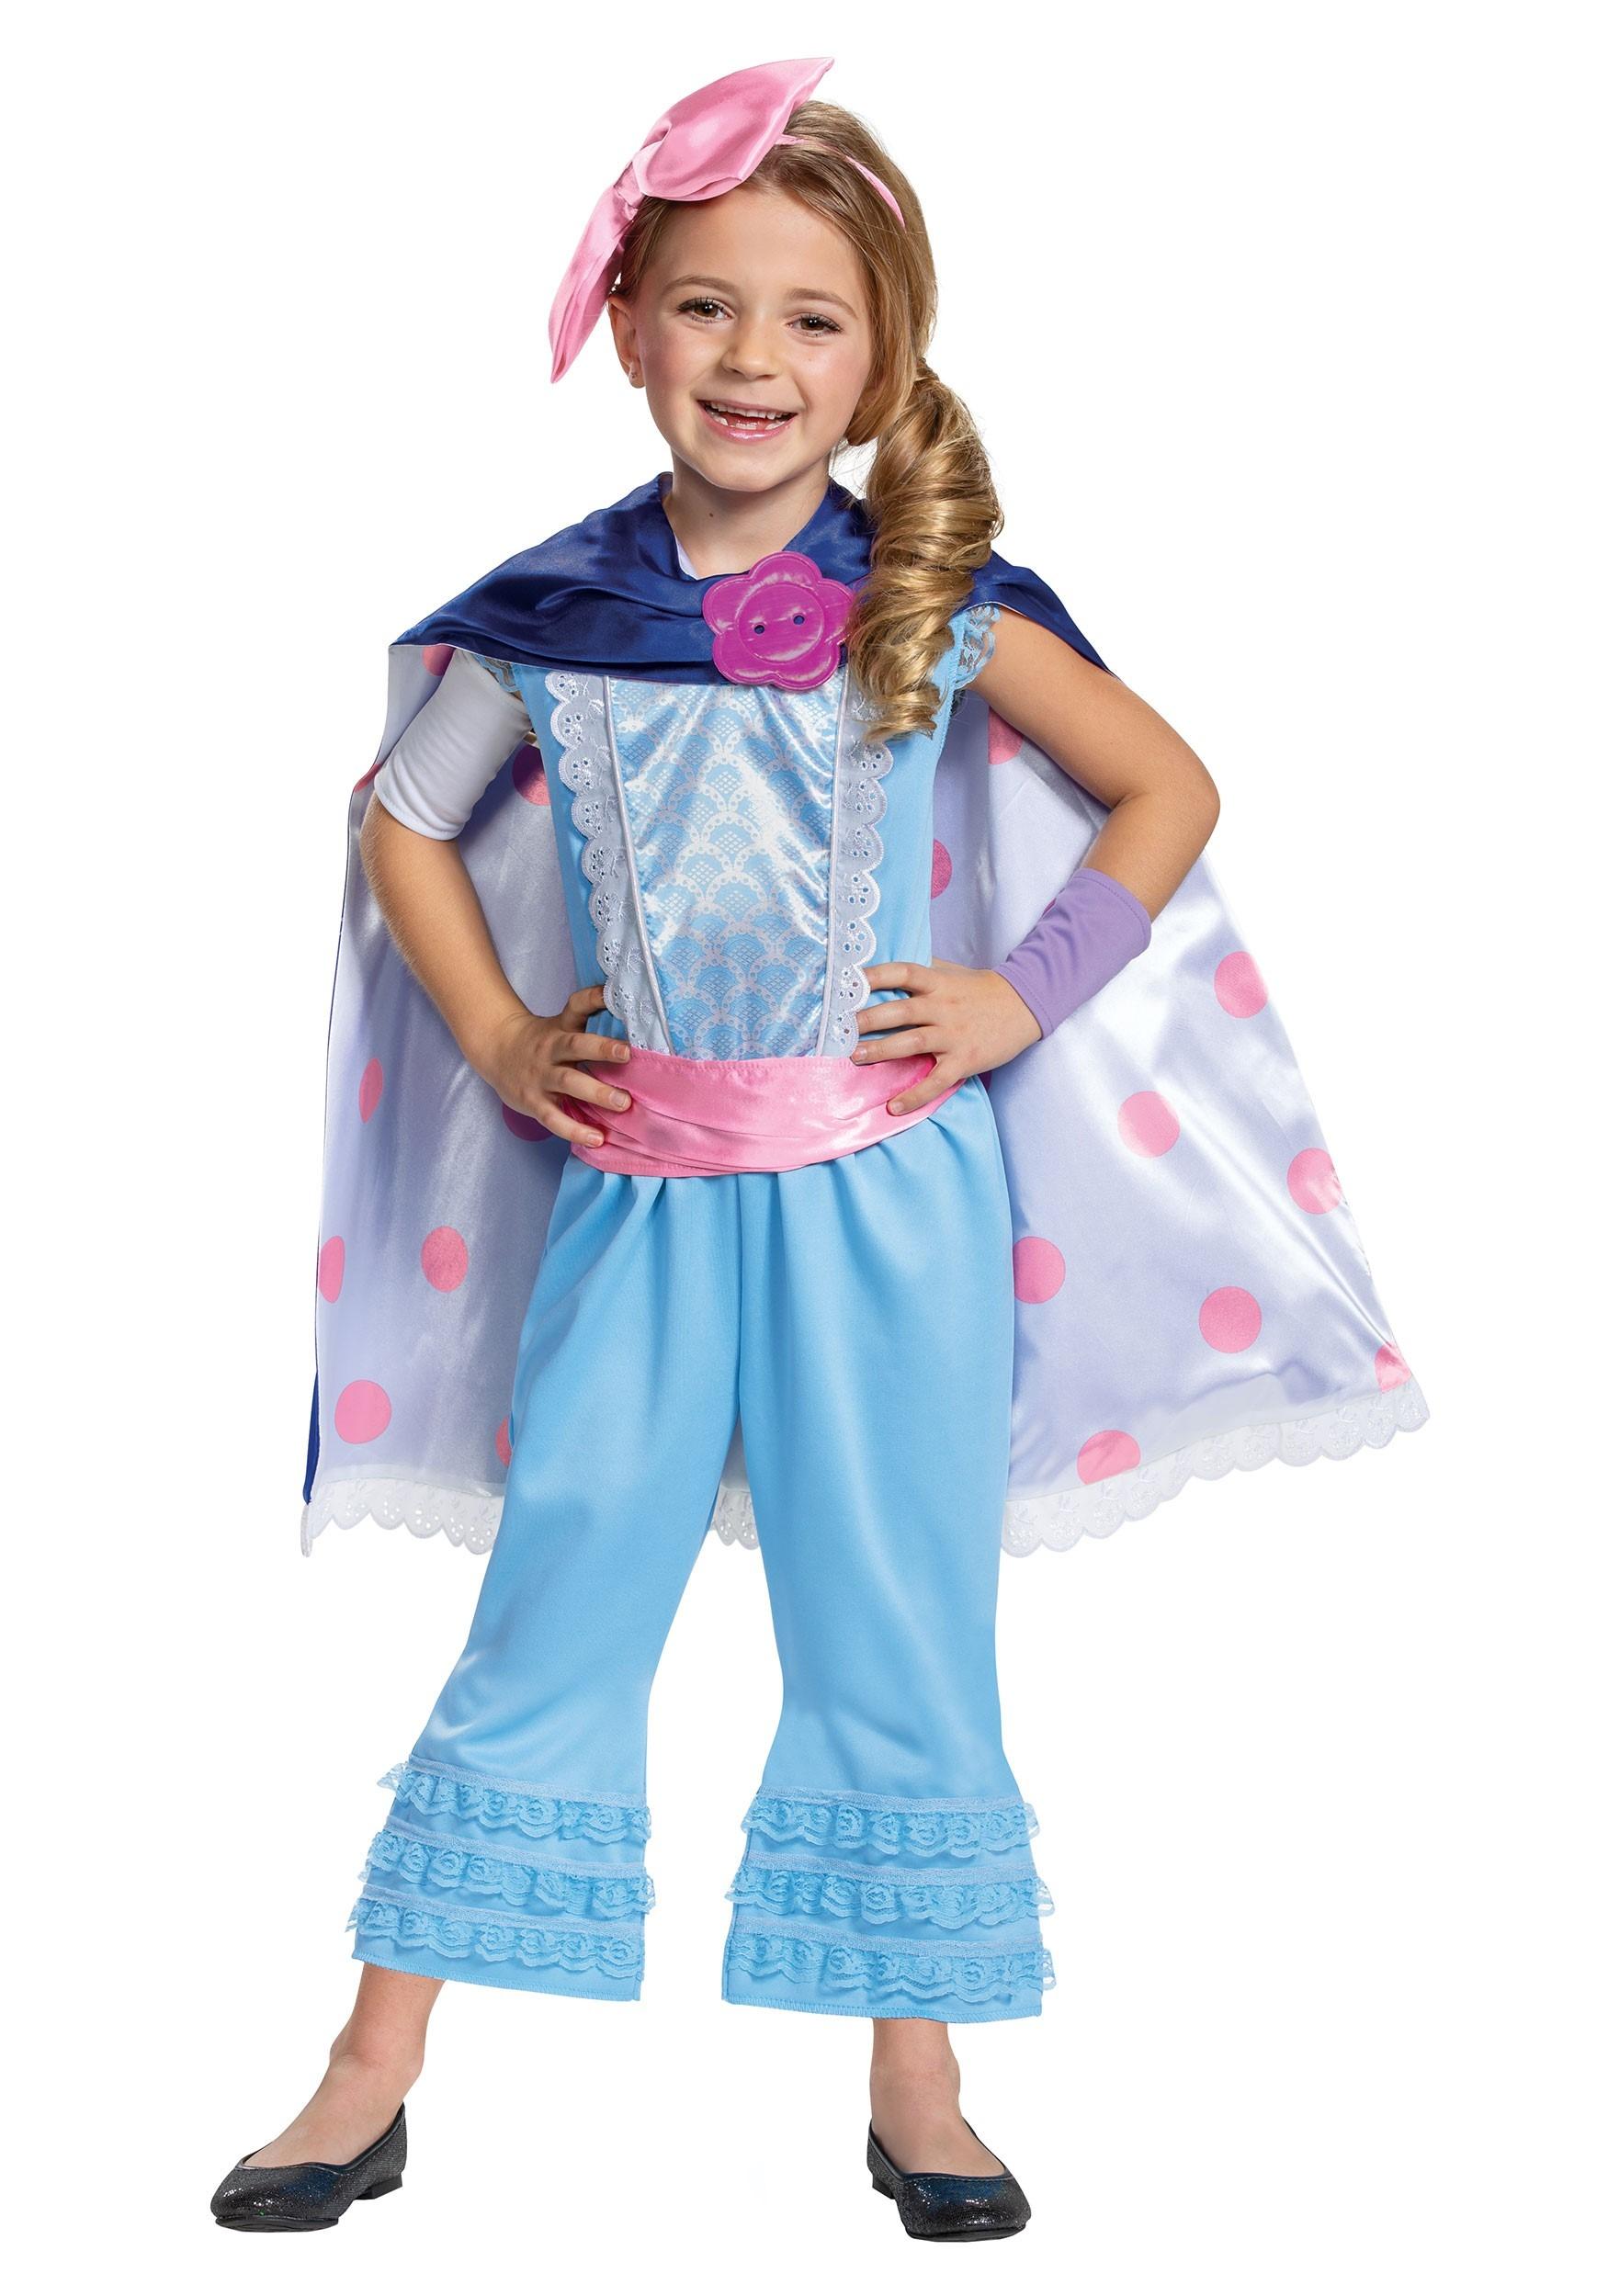 Toy Story 4 Halloween Costumes.Disney Toy Story Girls Bo Peep Deluxe Costume